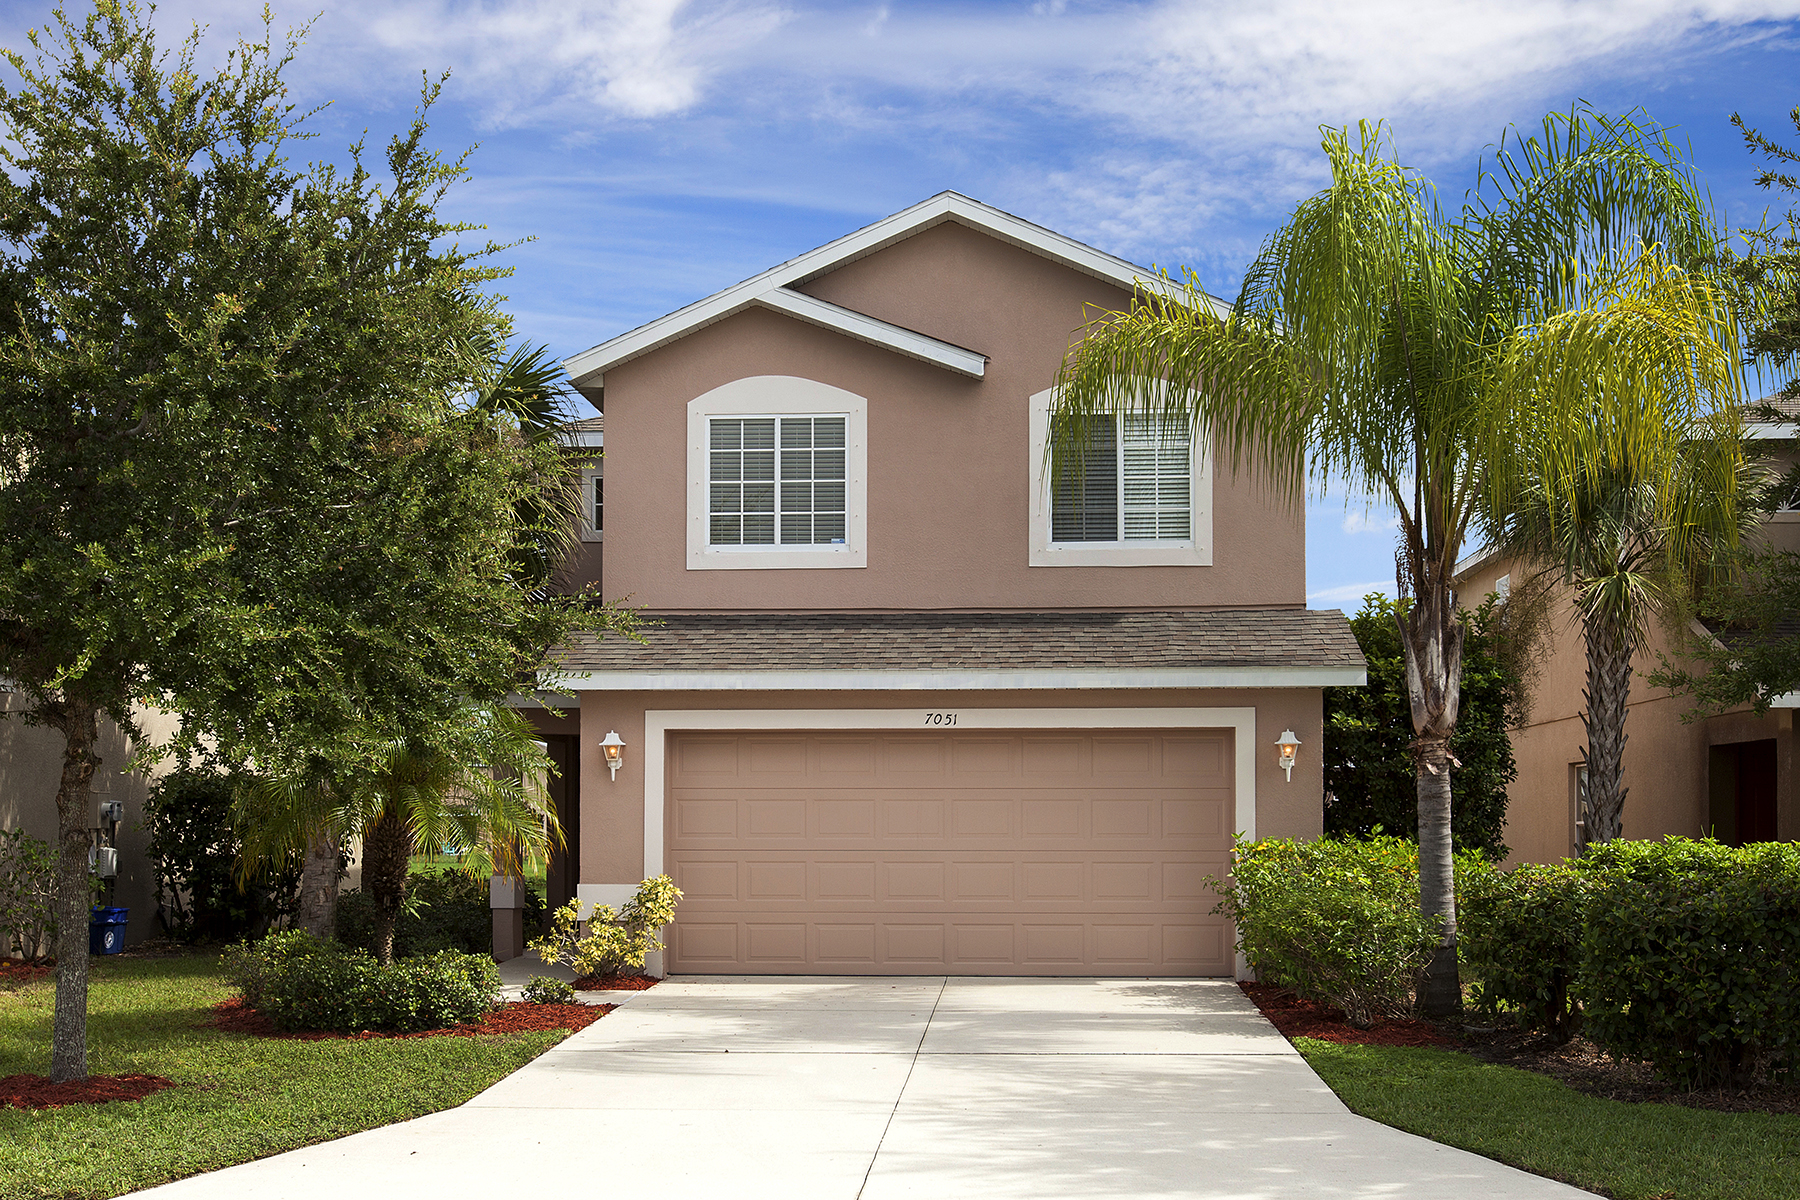 Moradia para Venda às LIGHTHOUSE COVE AT HERITAGE 7051 Montauk Point Bradenton, Florida 34212 Estados Unidos